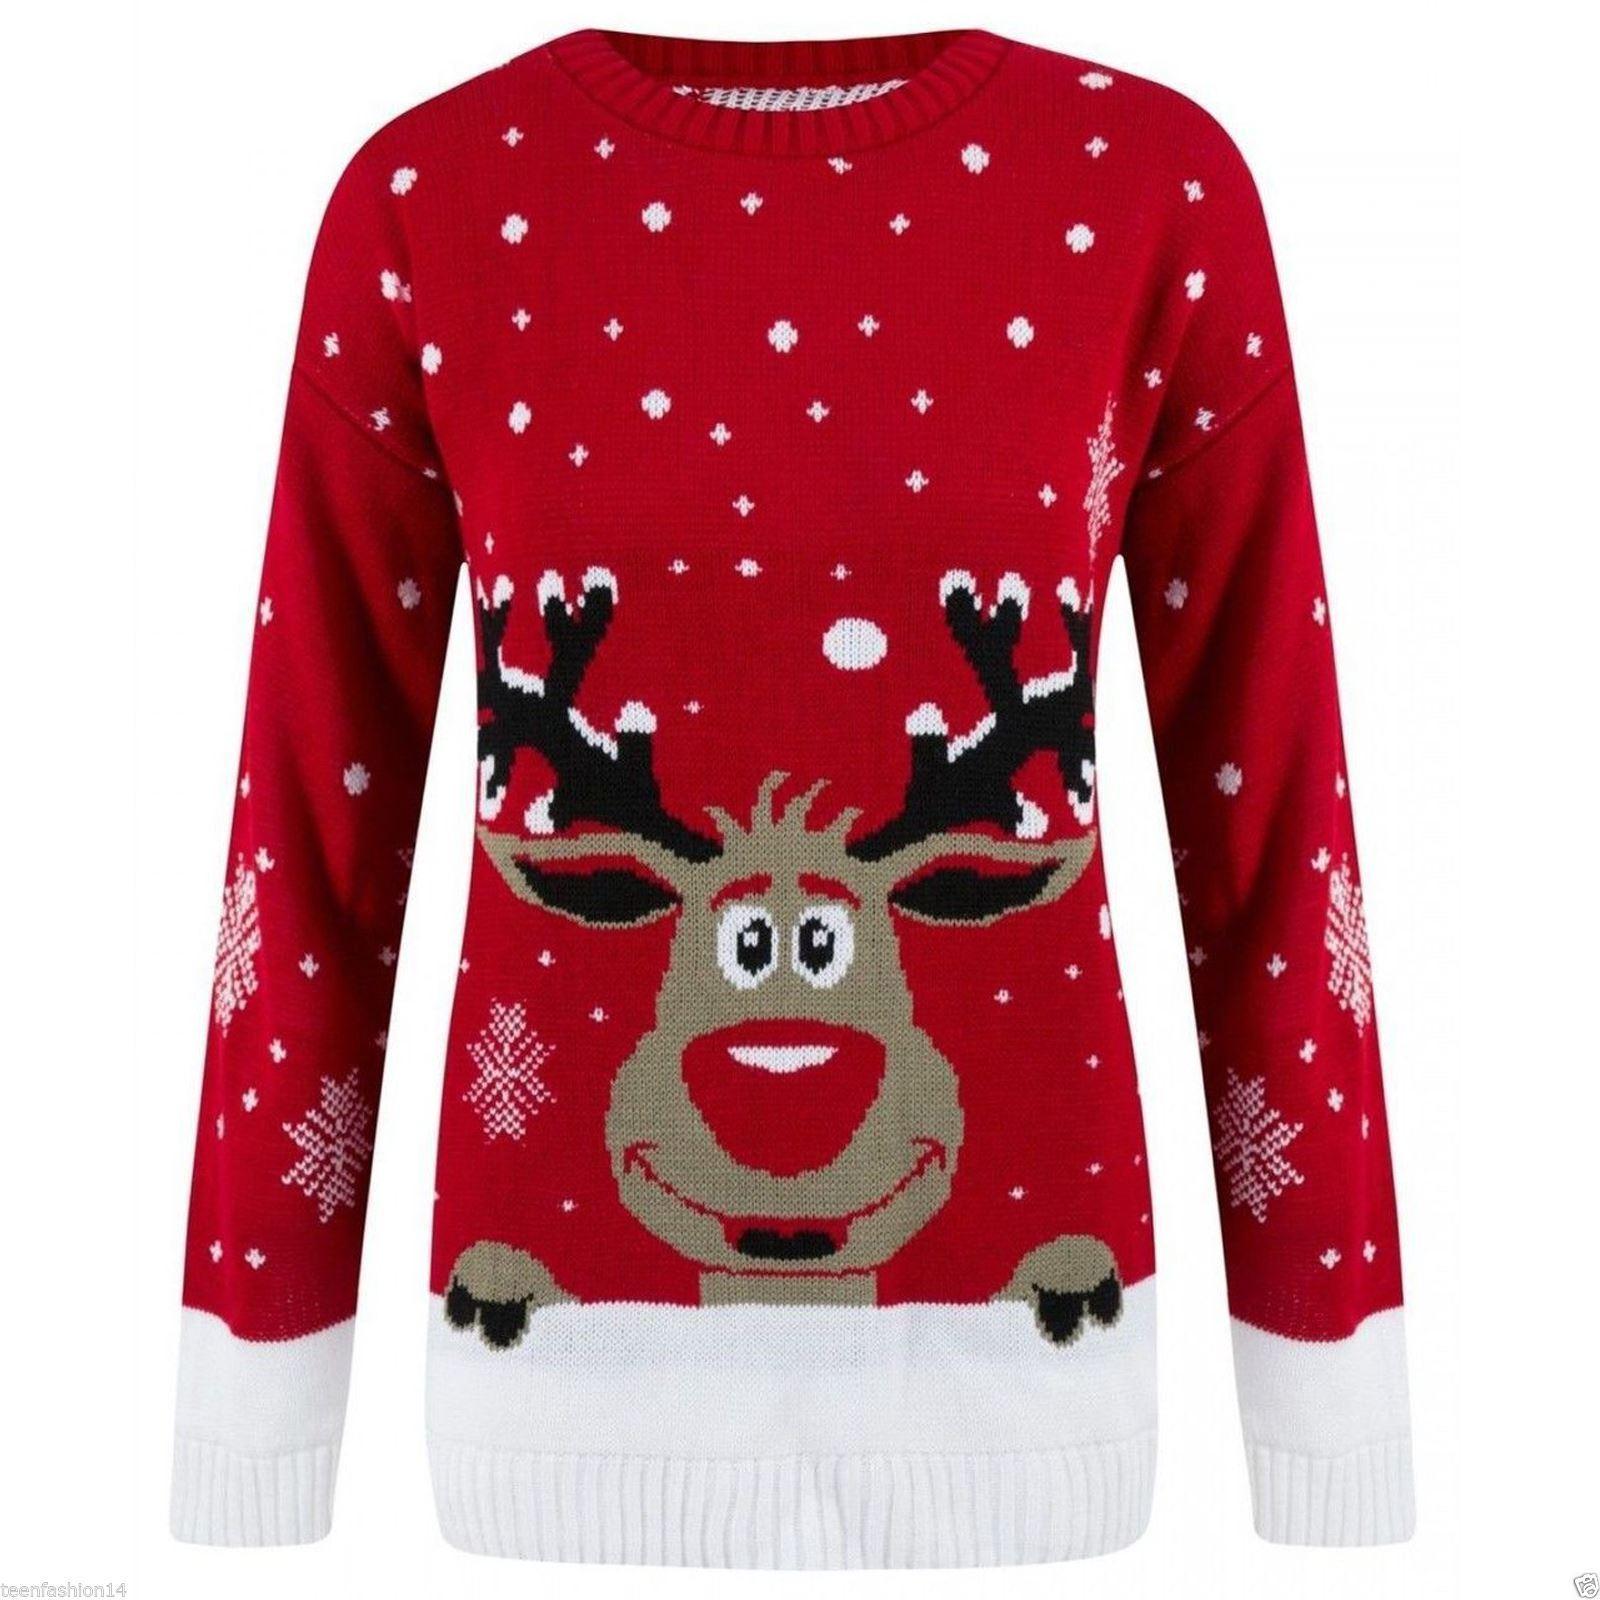 Unisex Christmas Gift Ideas: Womens Sweater Jumper Unisex Mens Xmas Reindeer Christmas